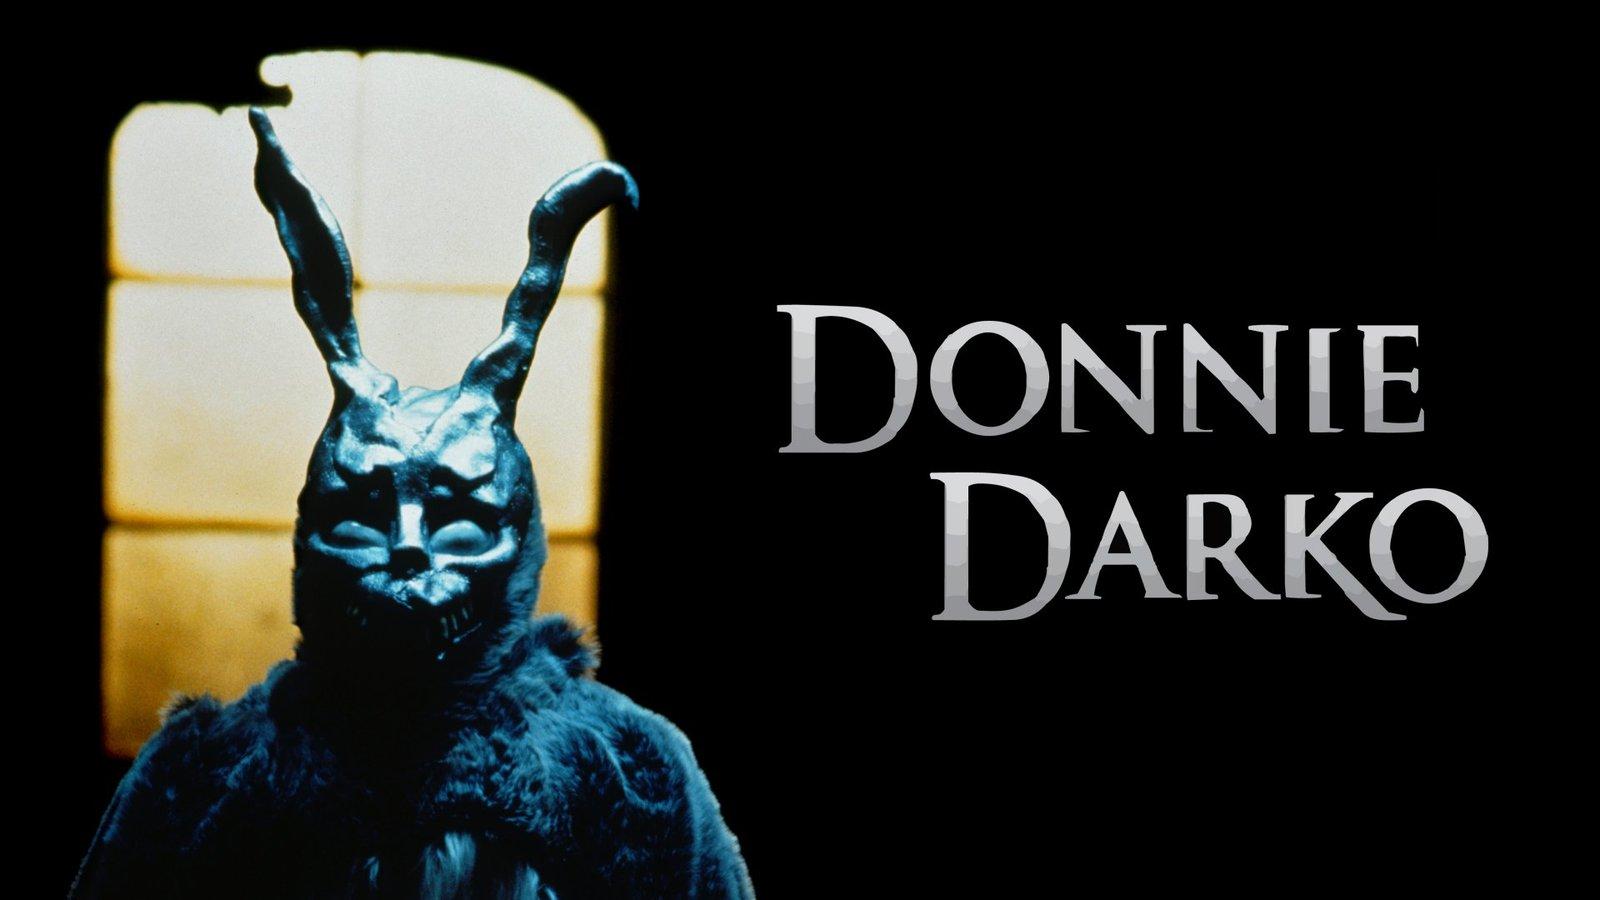 Resensi Film Donnie Darko : The philosophy of Time Travel